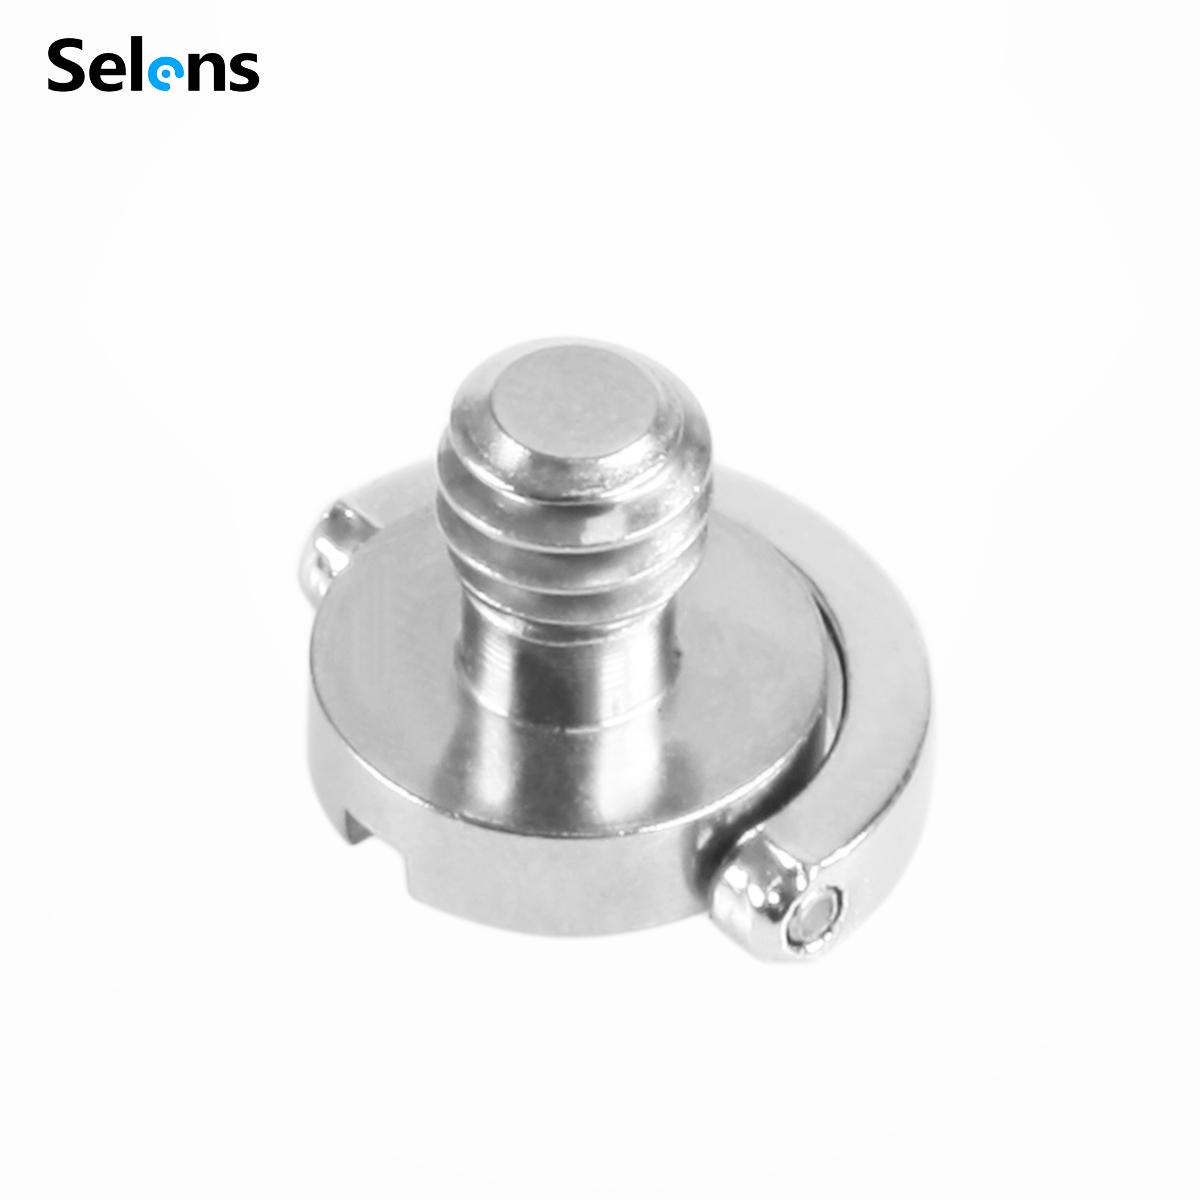 Selens 三脚架云台快装板螺丝 相机连接1/4螺丝 不锈钢通用升级型